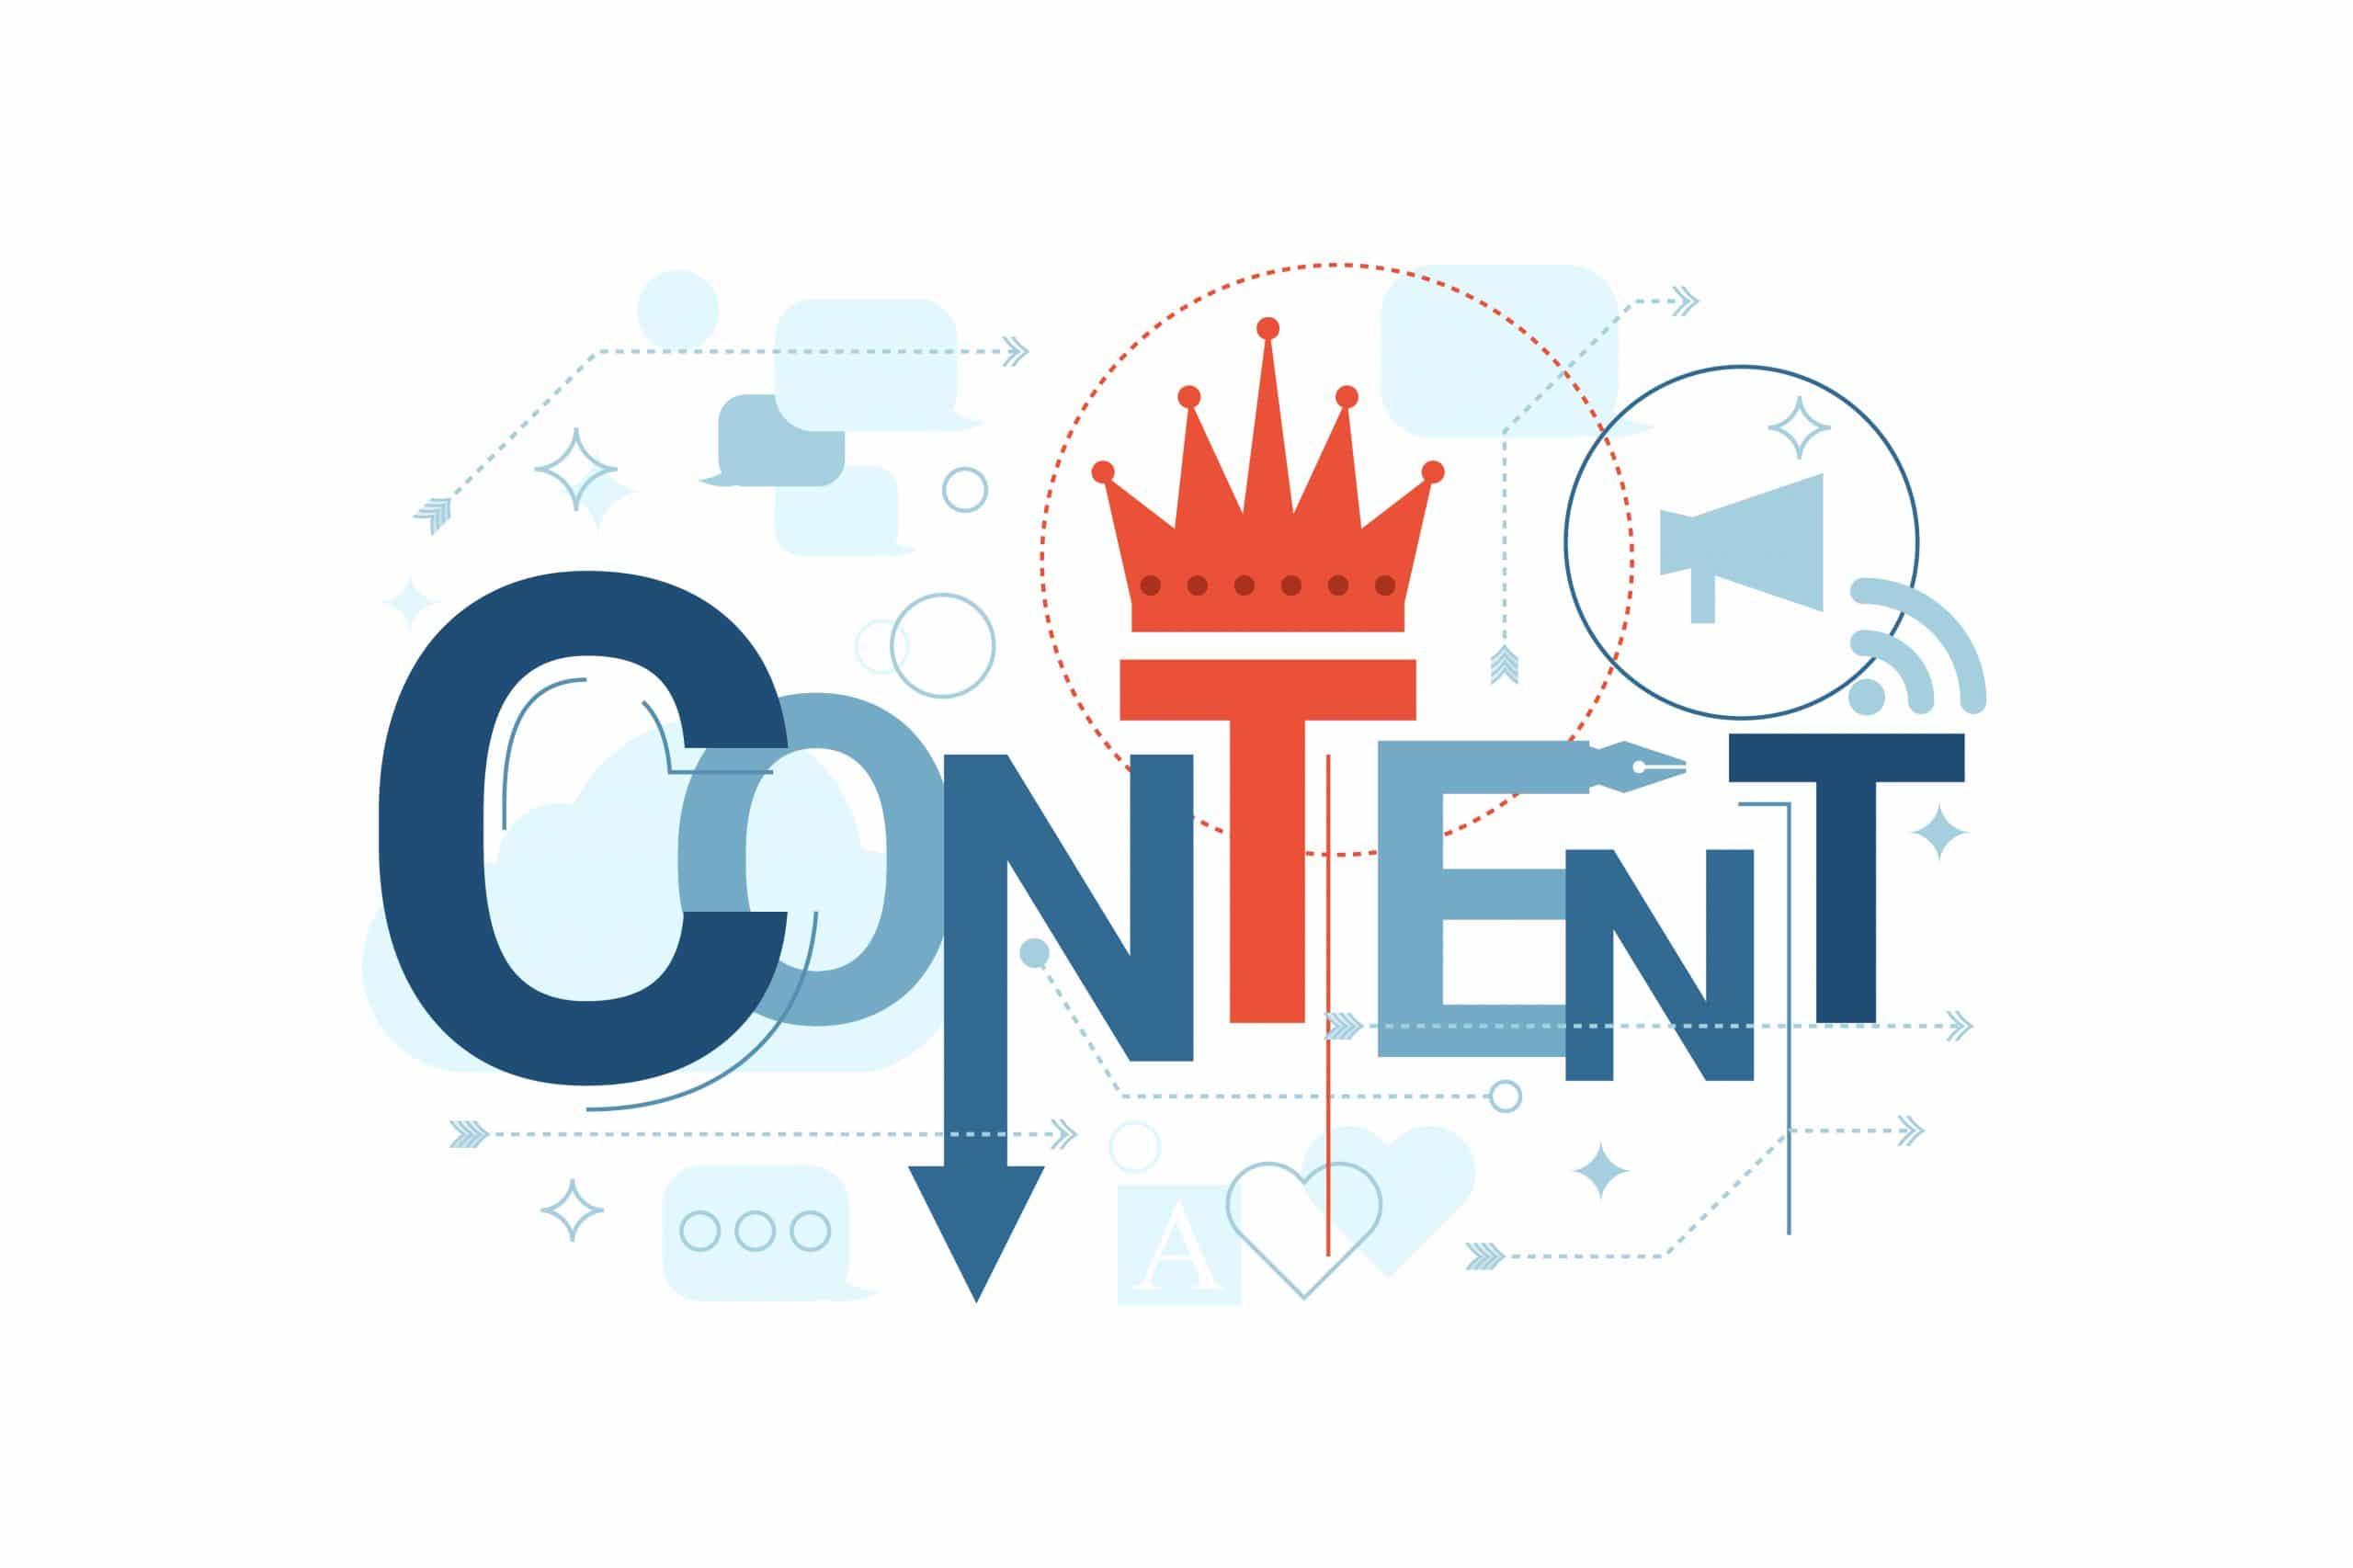 Content: Content-Driven Marketing Vs. Content Marketing